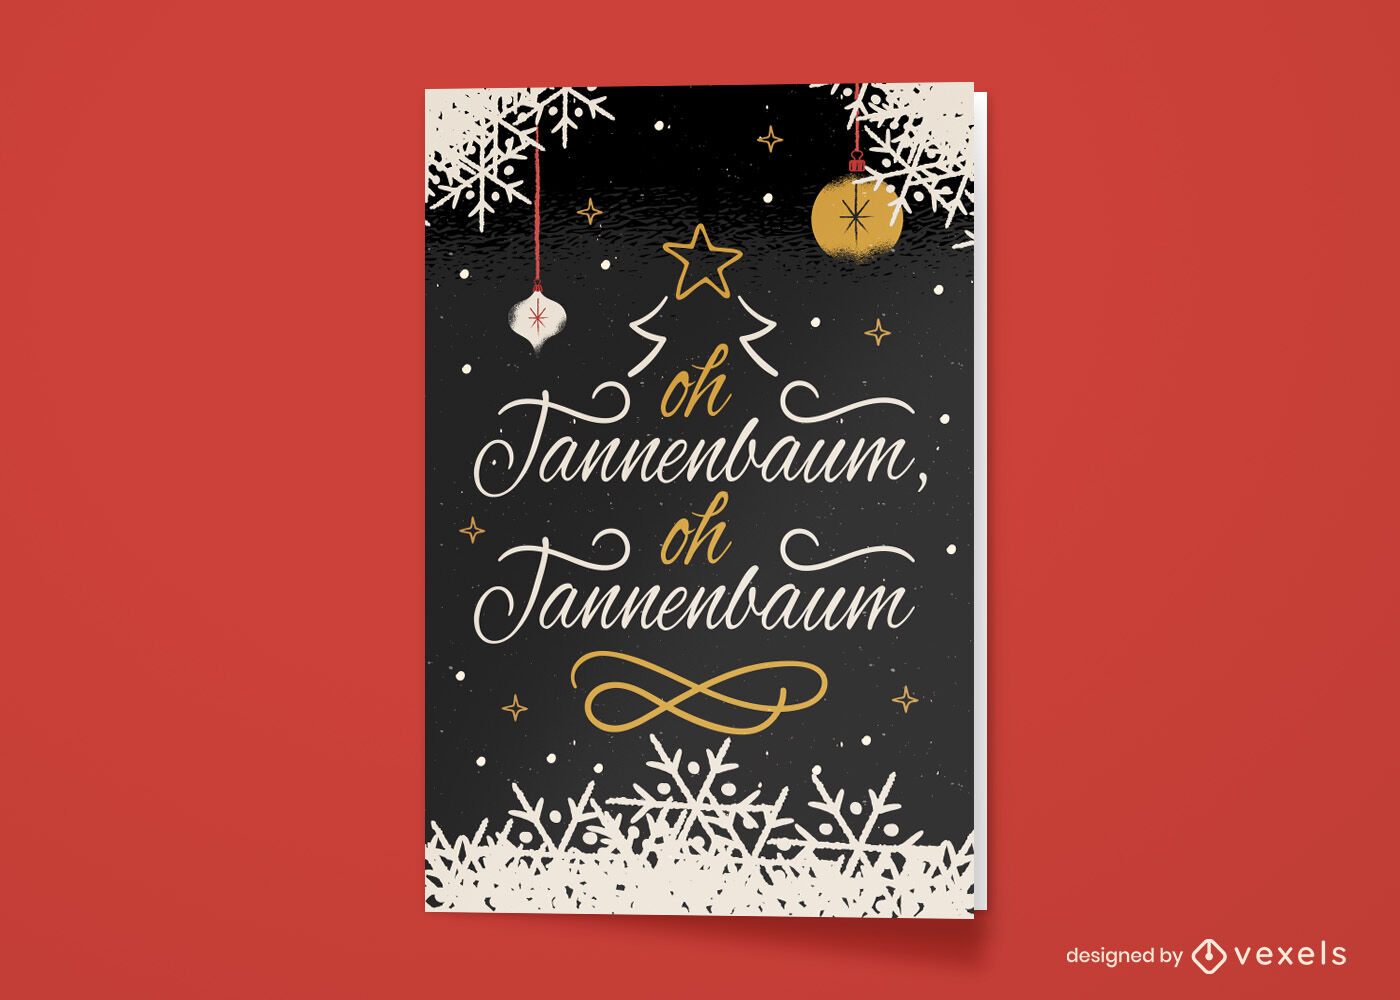 Tarjeta de felicitación navideña alemana